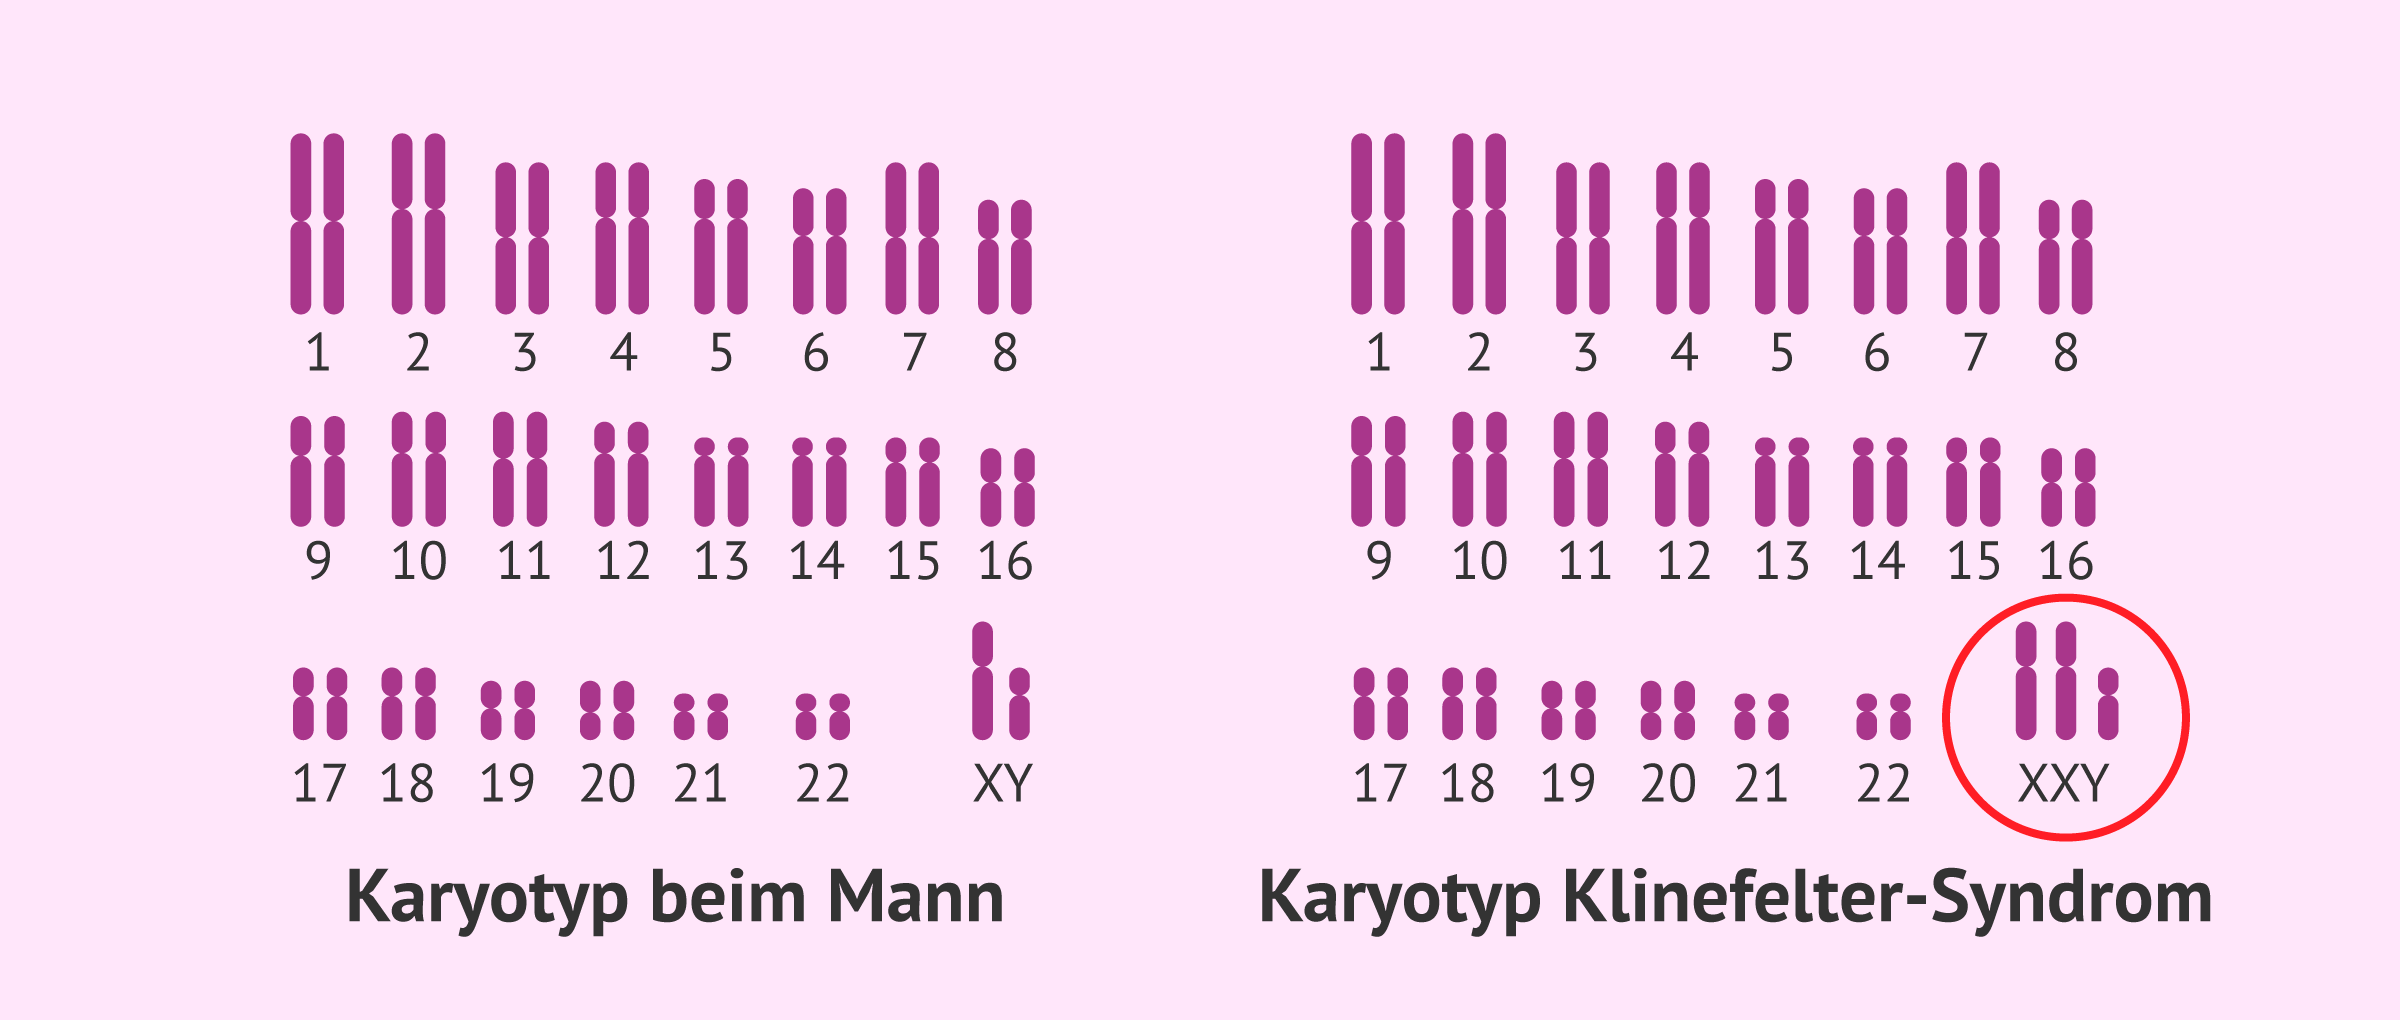 Normaler Karyotyp und Karyotyp bei Klinefelter-Syndrom